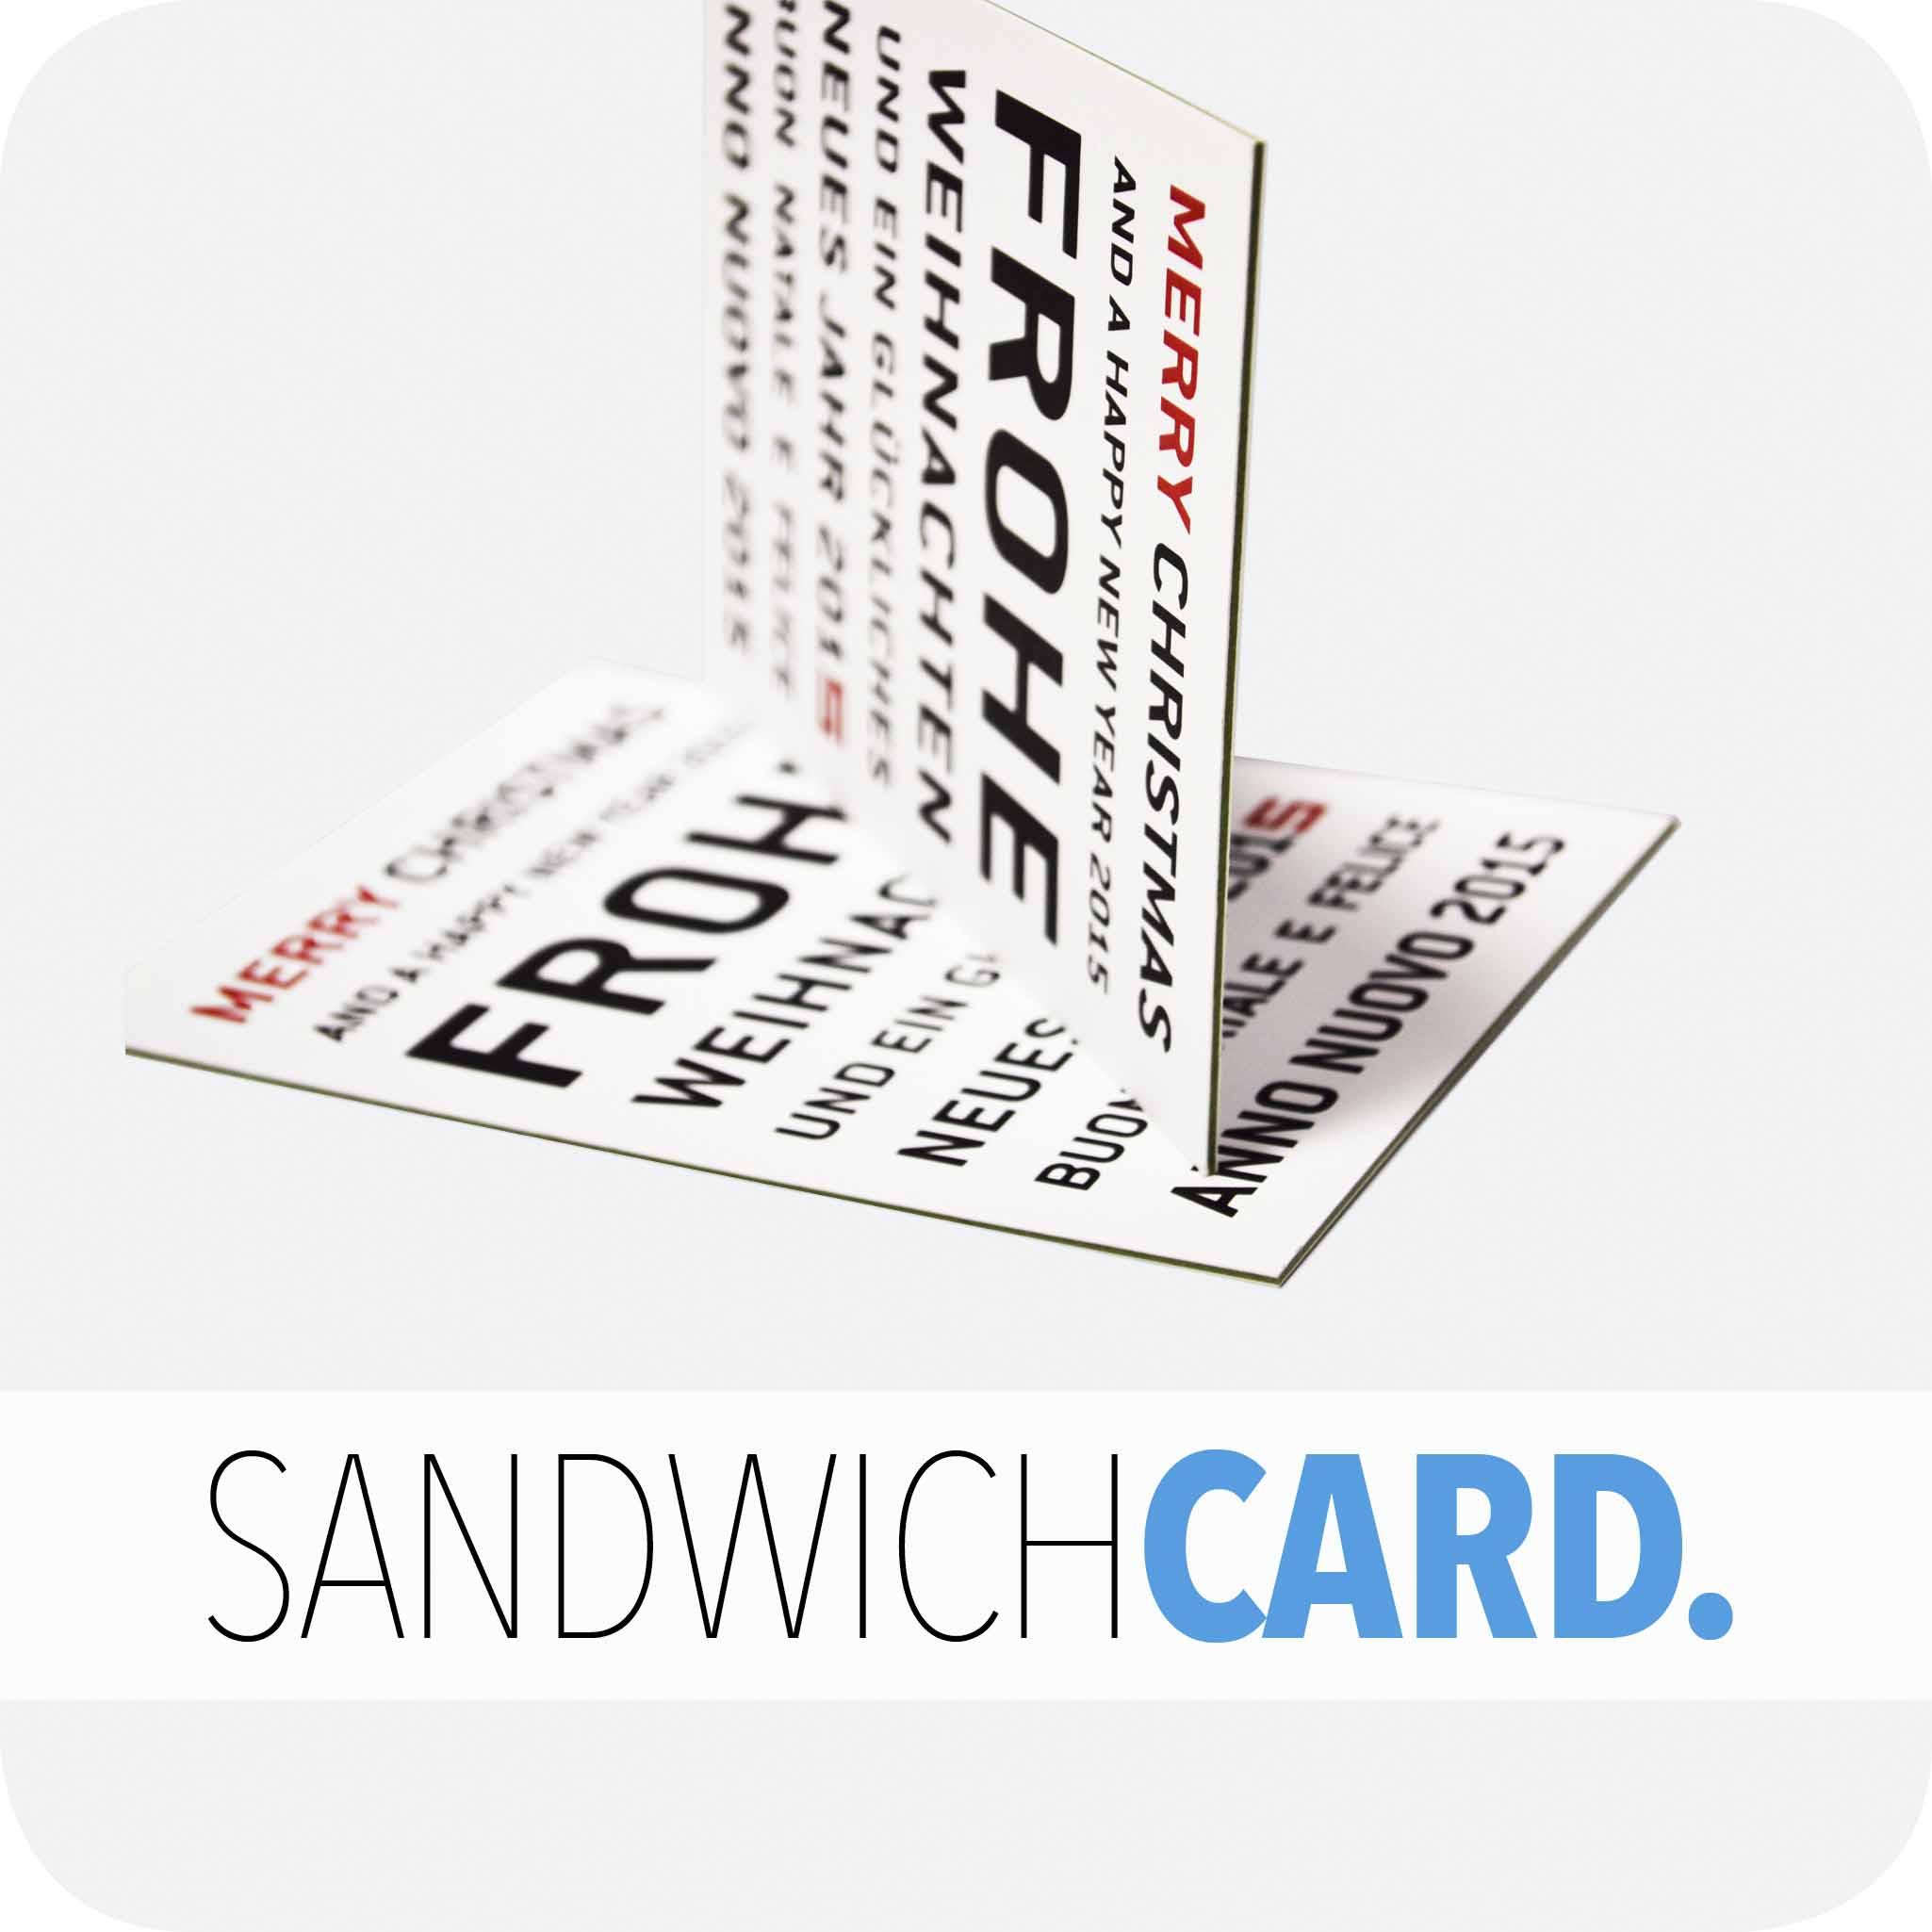 Sandwichcard